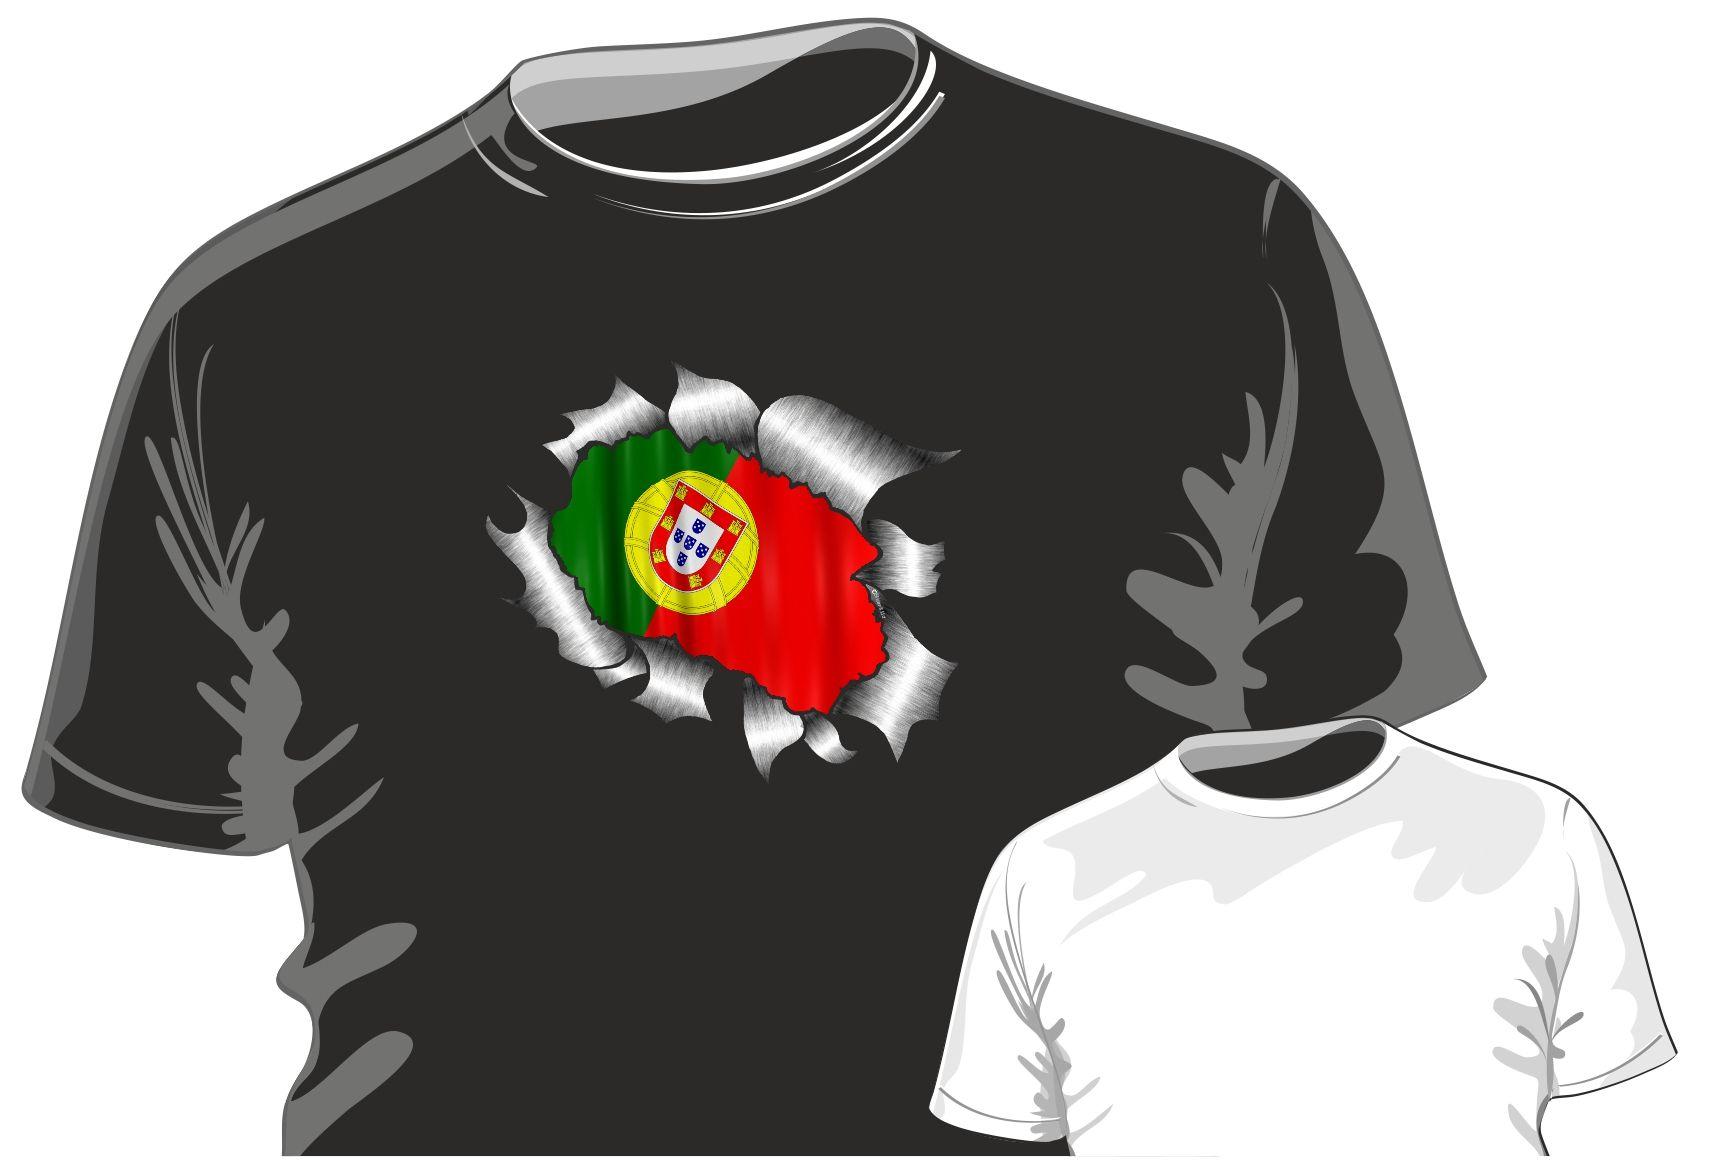 T Shirt Printing Uk Good Quality Rldm